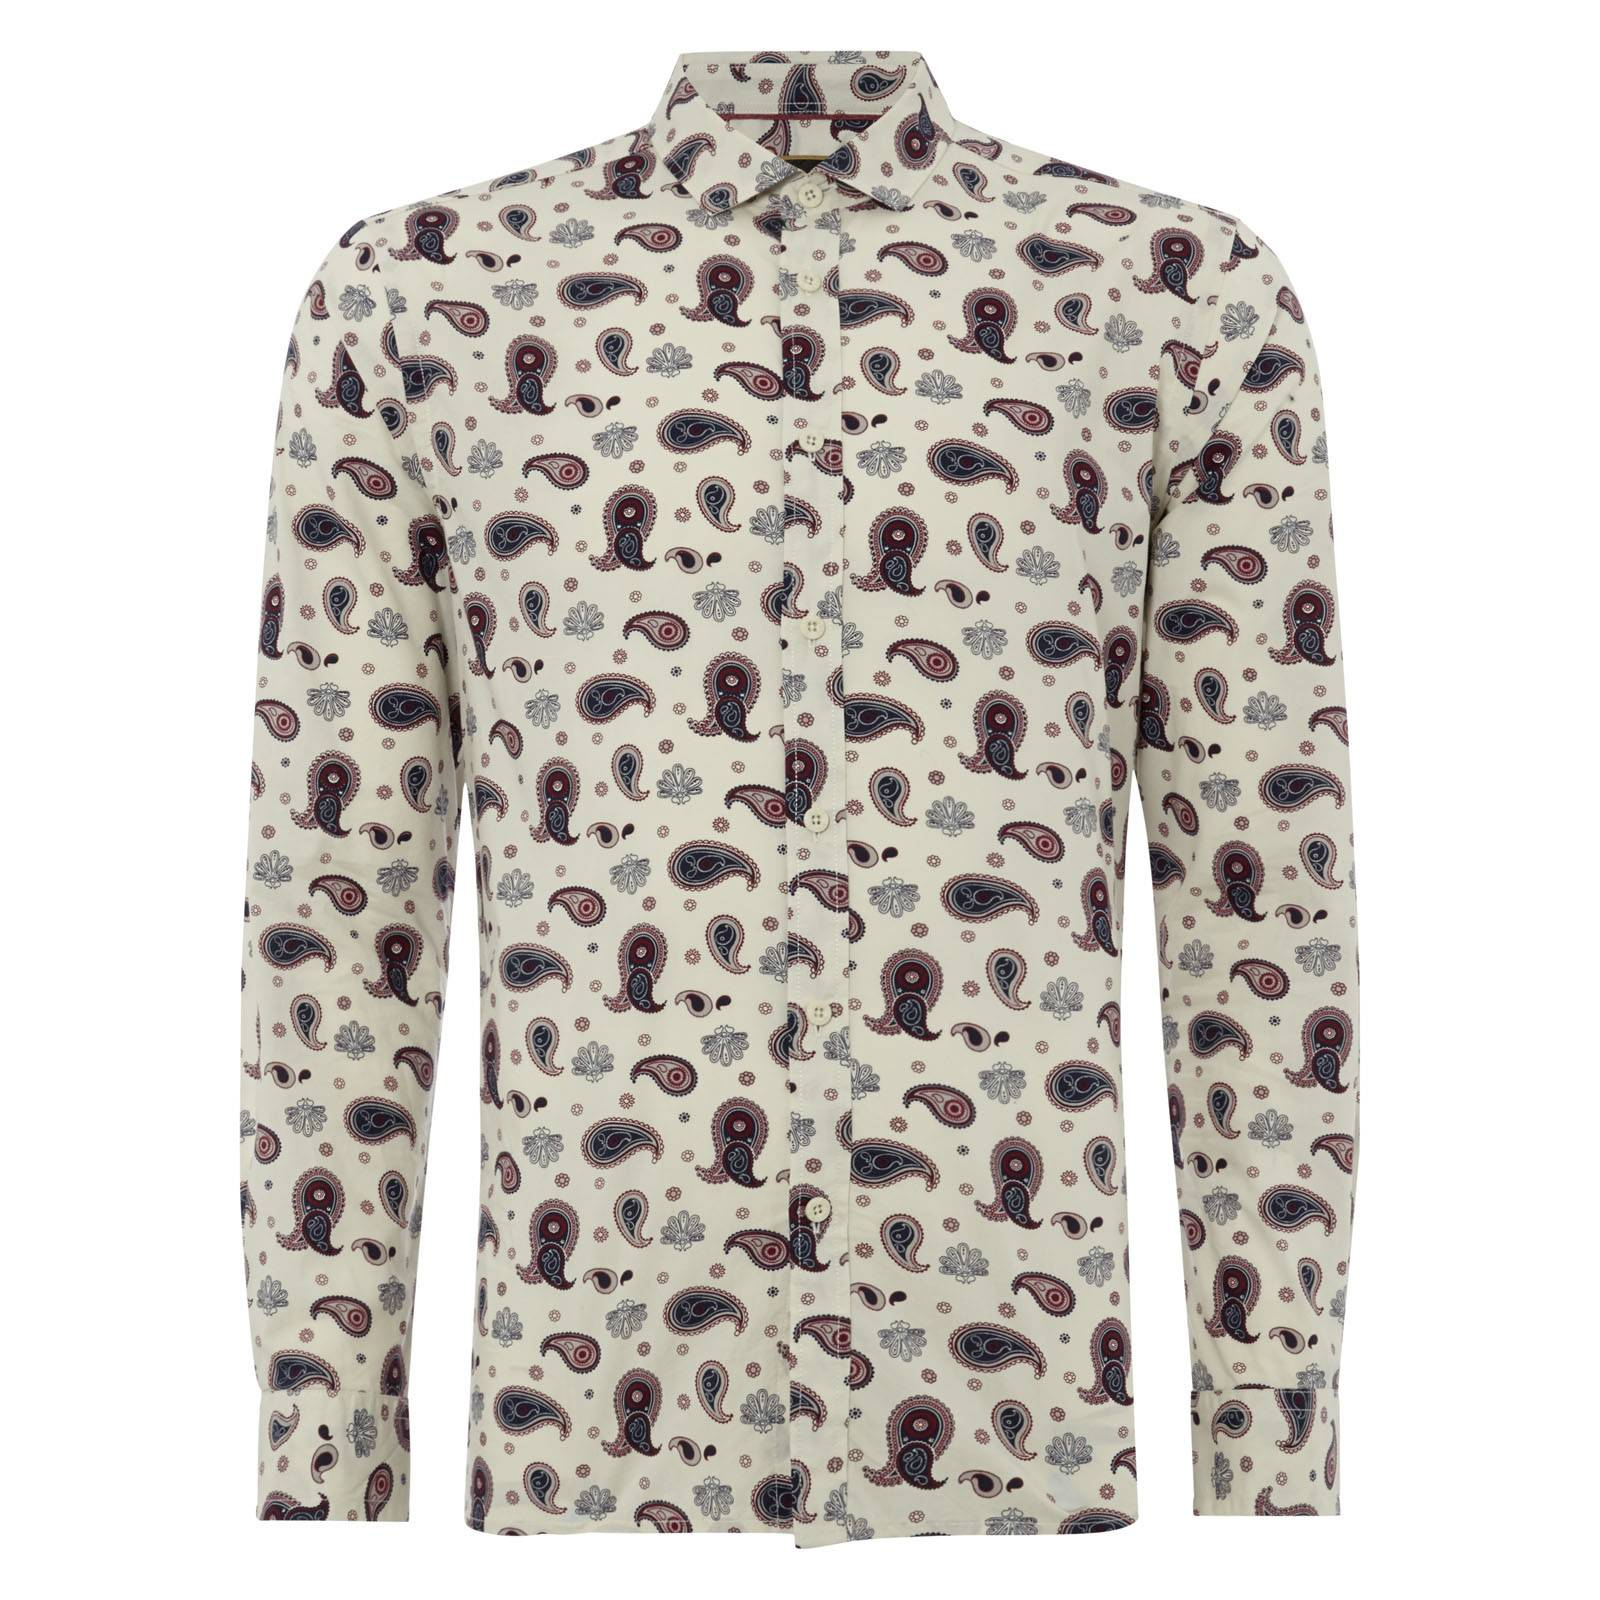 Рубашка Kean от MercLondon